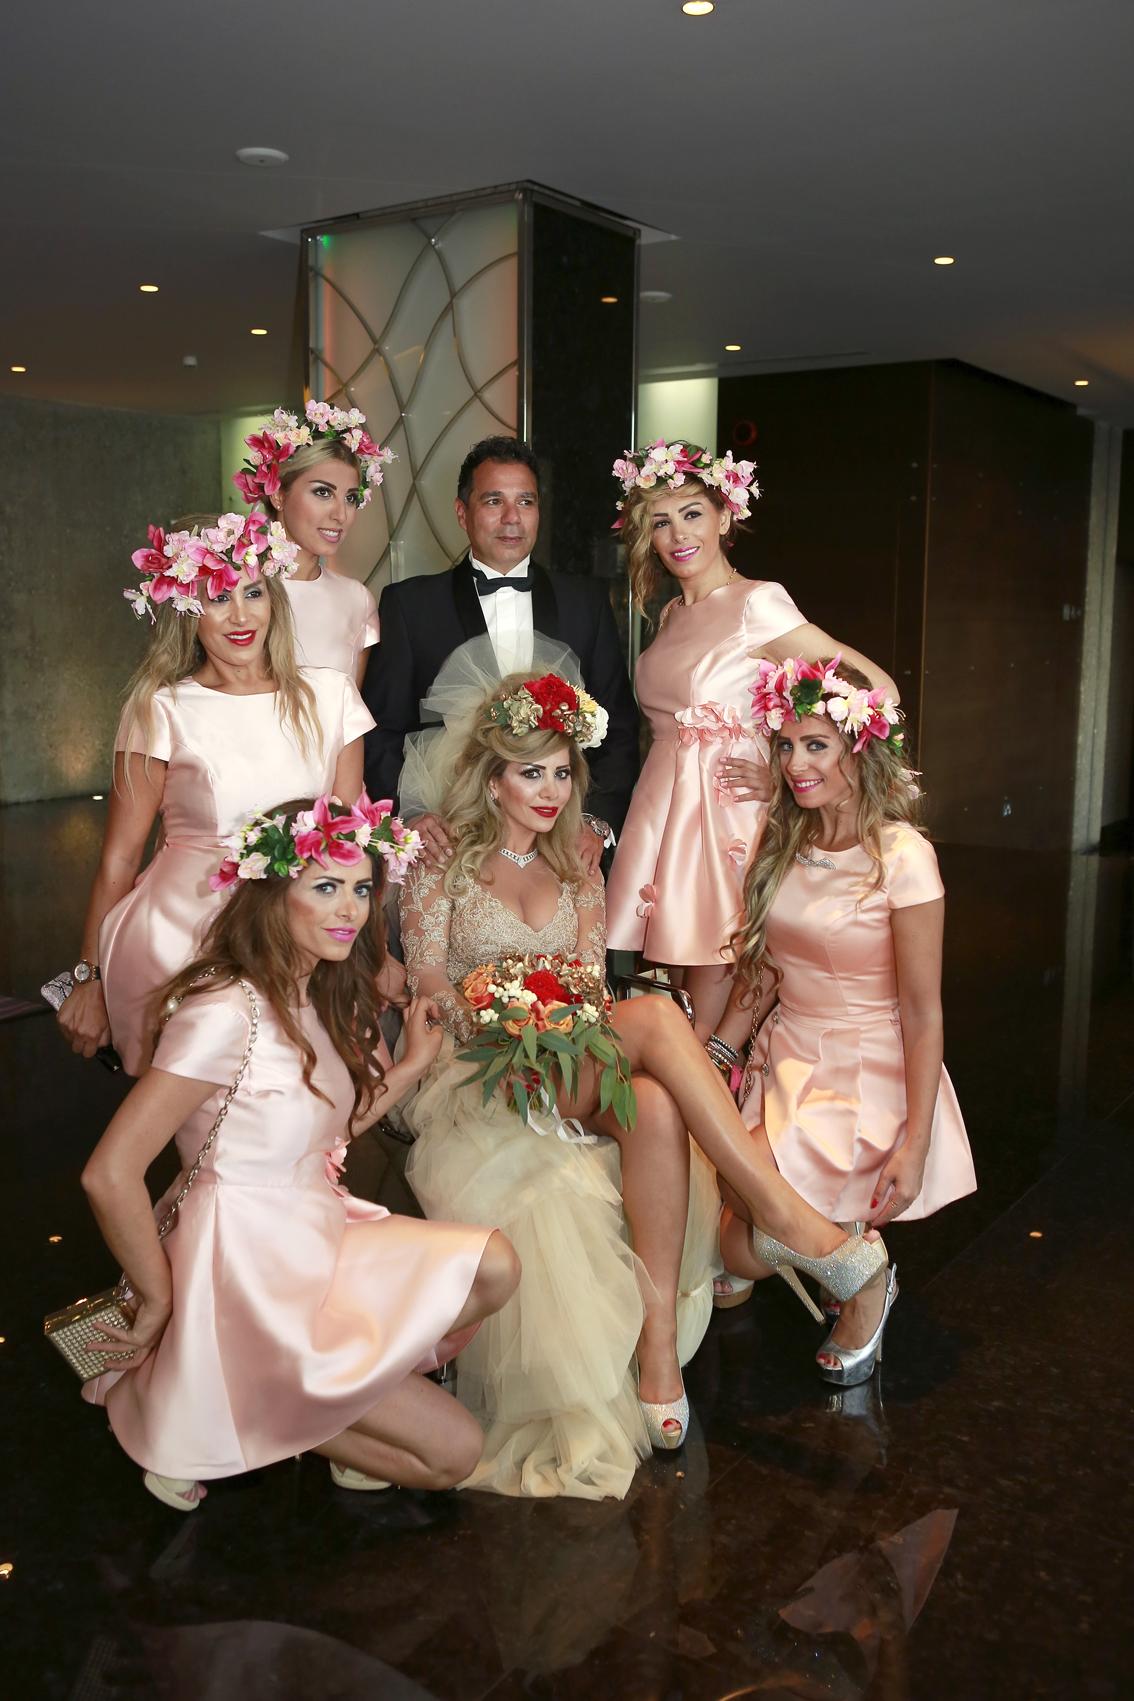 www.dcphotoprint.com #weddingphotography   #pricing   #weddingphotographyideas #love   #creative   #wedding   #photography   #best   #weddingphotographer   #candidweddingphotography   #weddingphotographycyprus   #lovely   #cyprusweddingphotography   #paphos   #limassol   #larnaca   #ayianapa   #protaras   Faouzi and Caroline at AMATHUS BEACH HOTEL, Limassol Cyprus